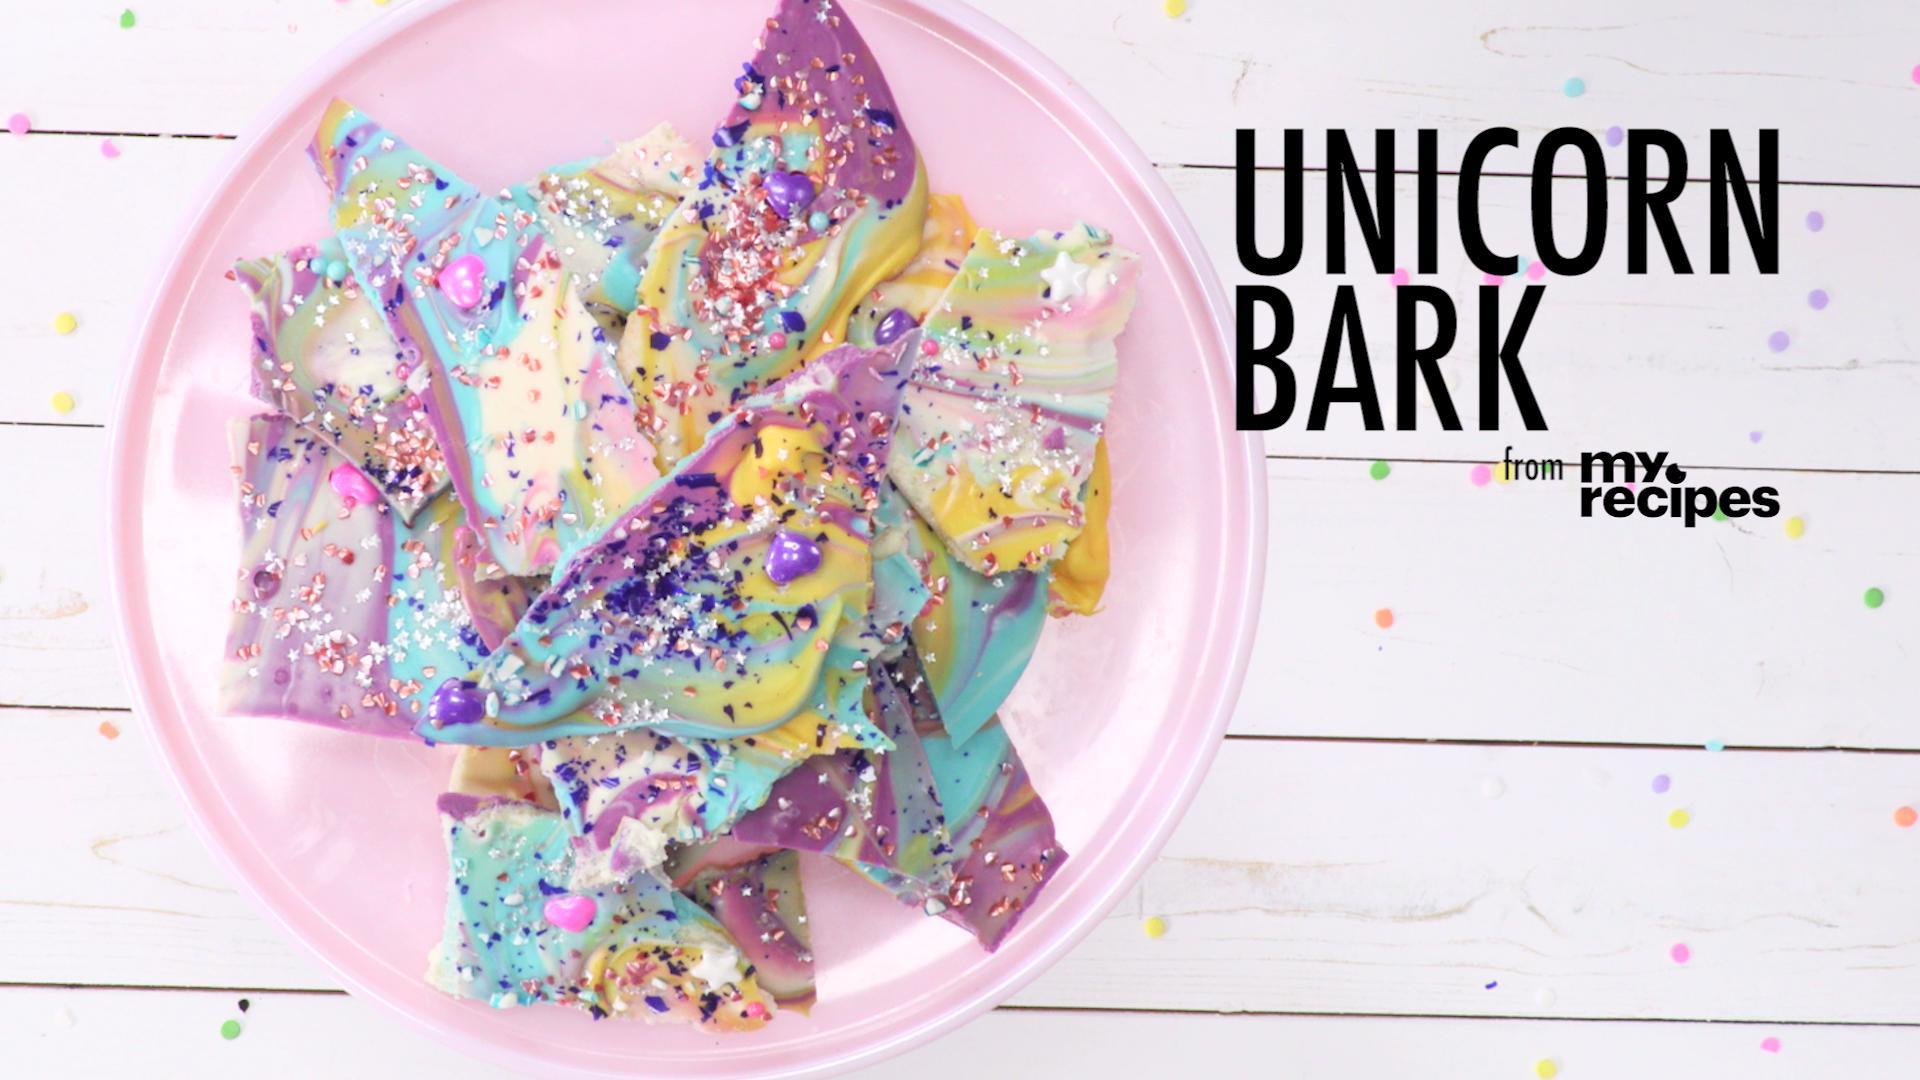 How to Make Unicorn Bark